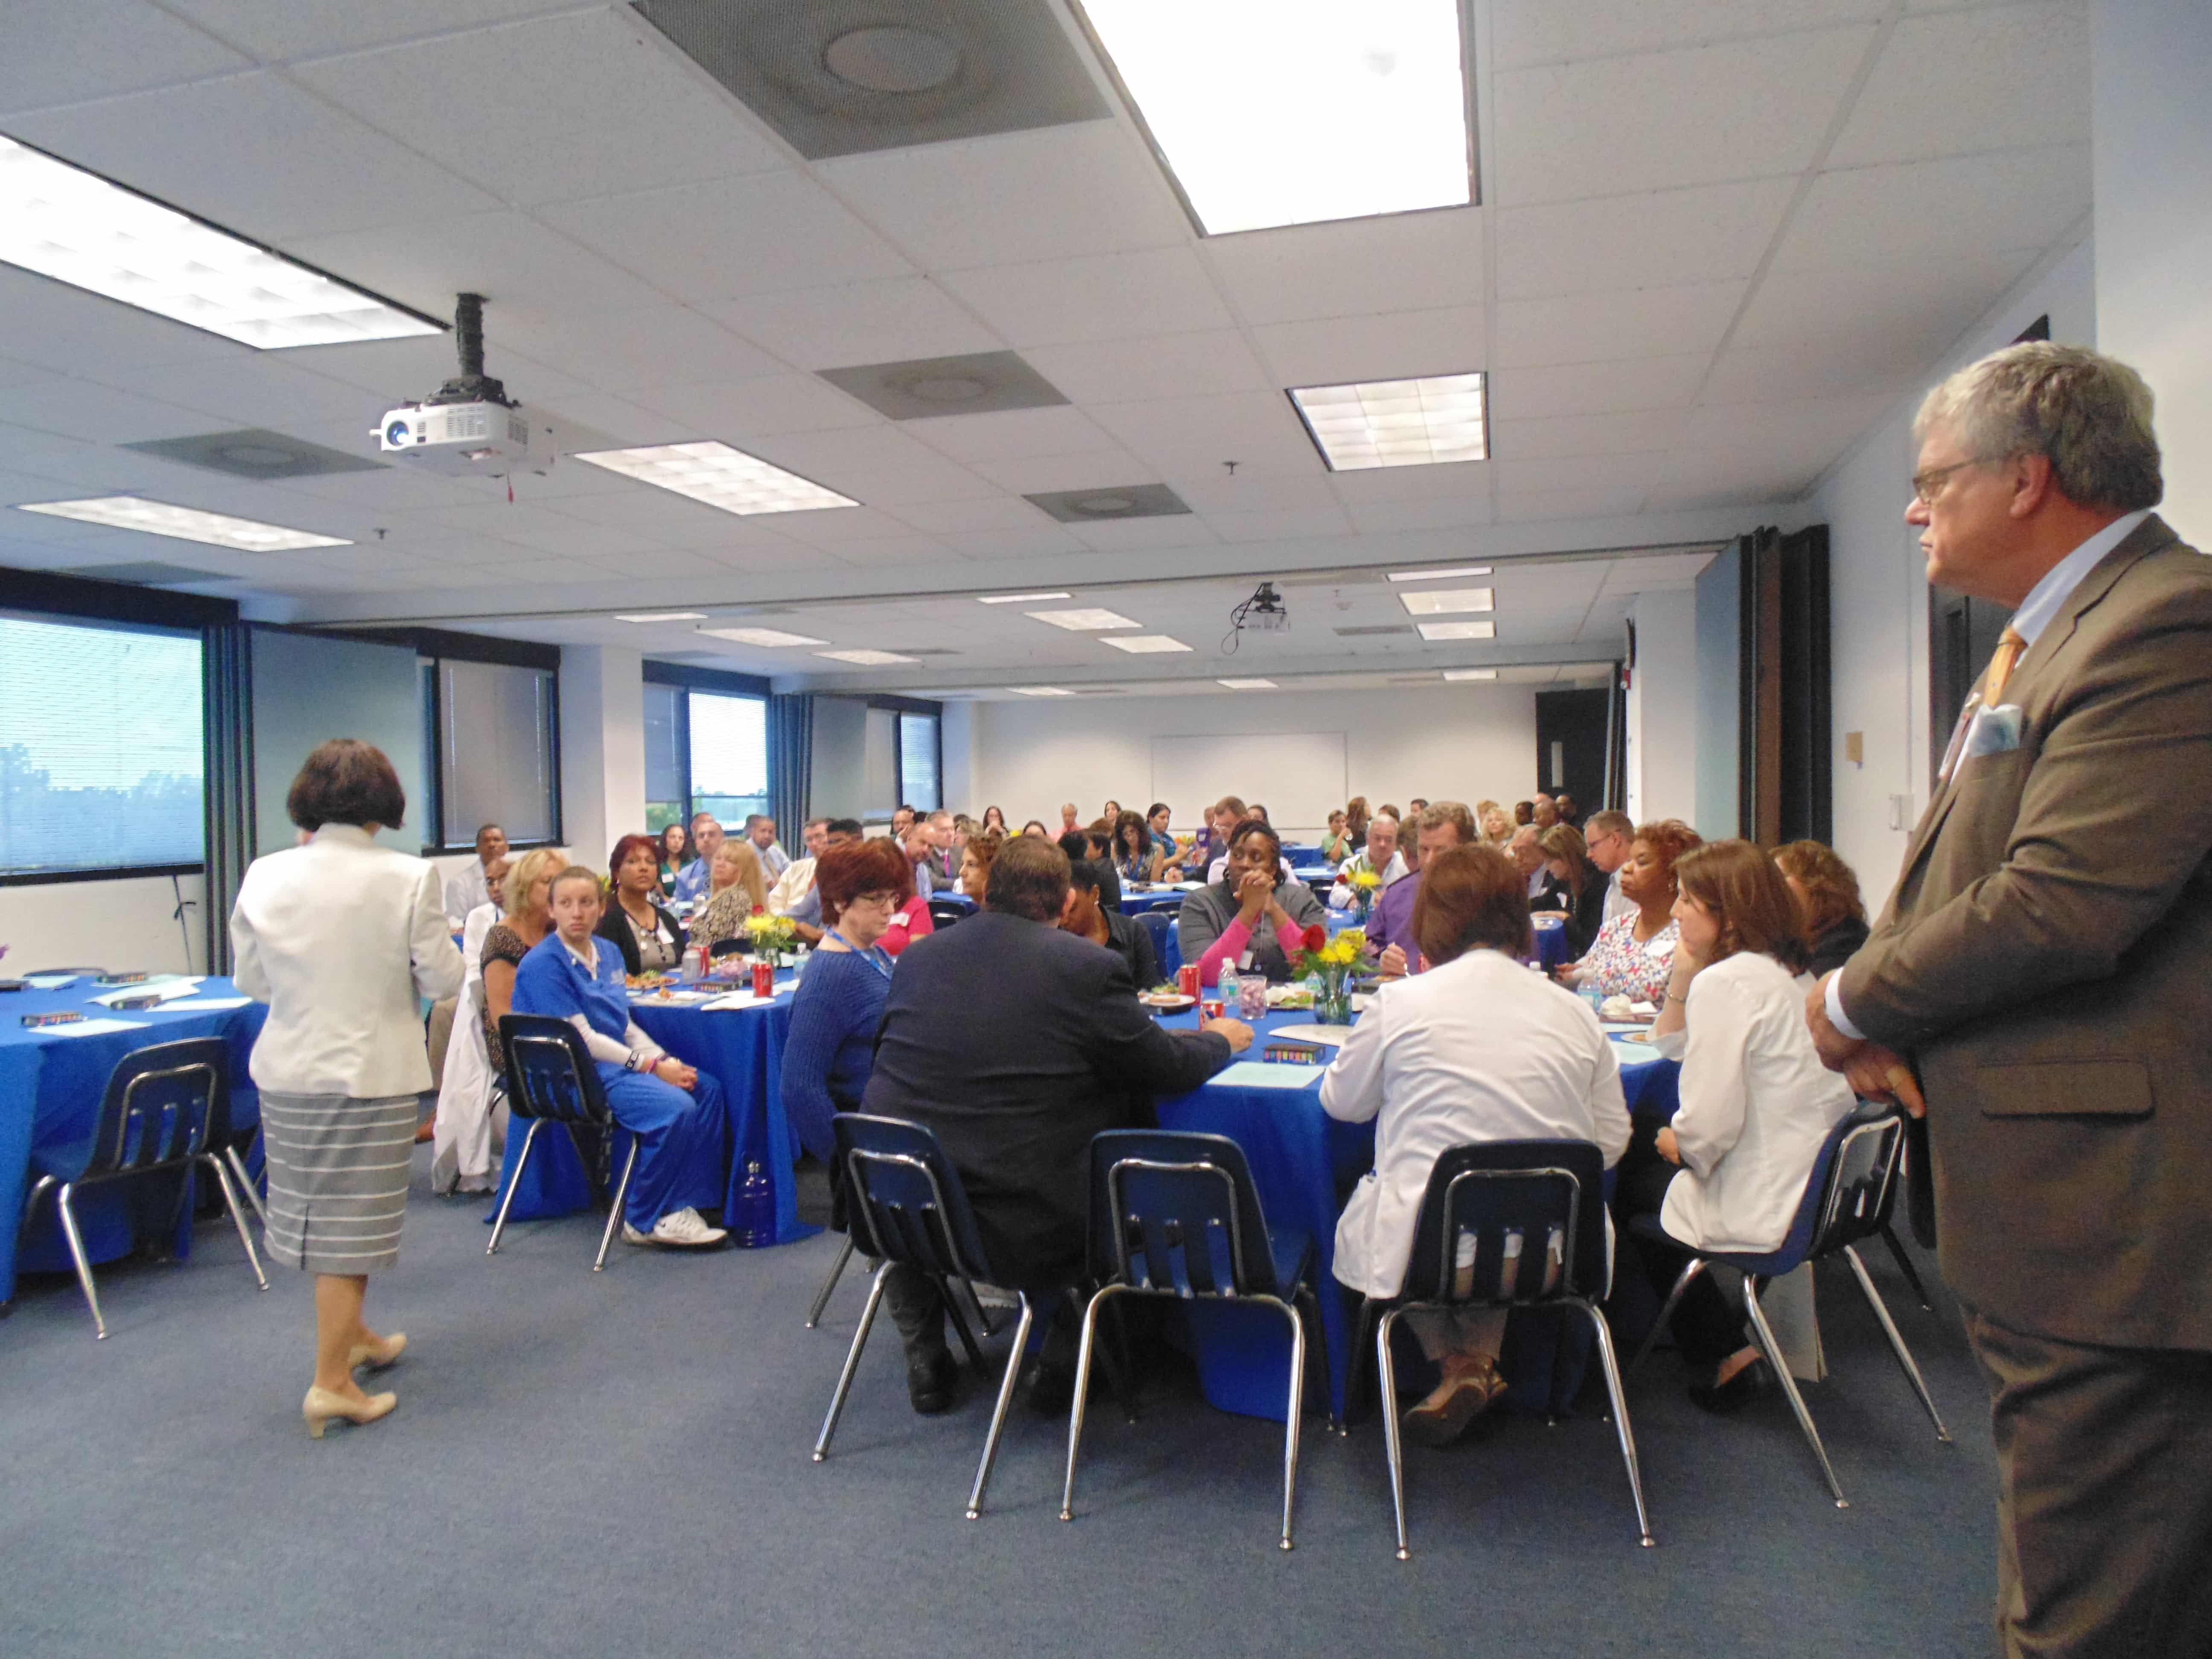 Ft. Lauderdale Holds Advisory Board Meeting